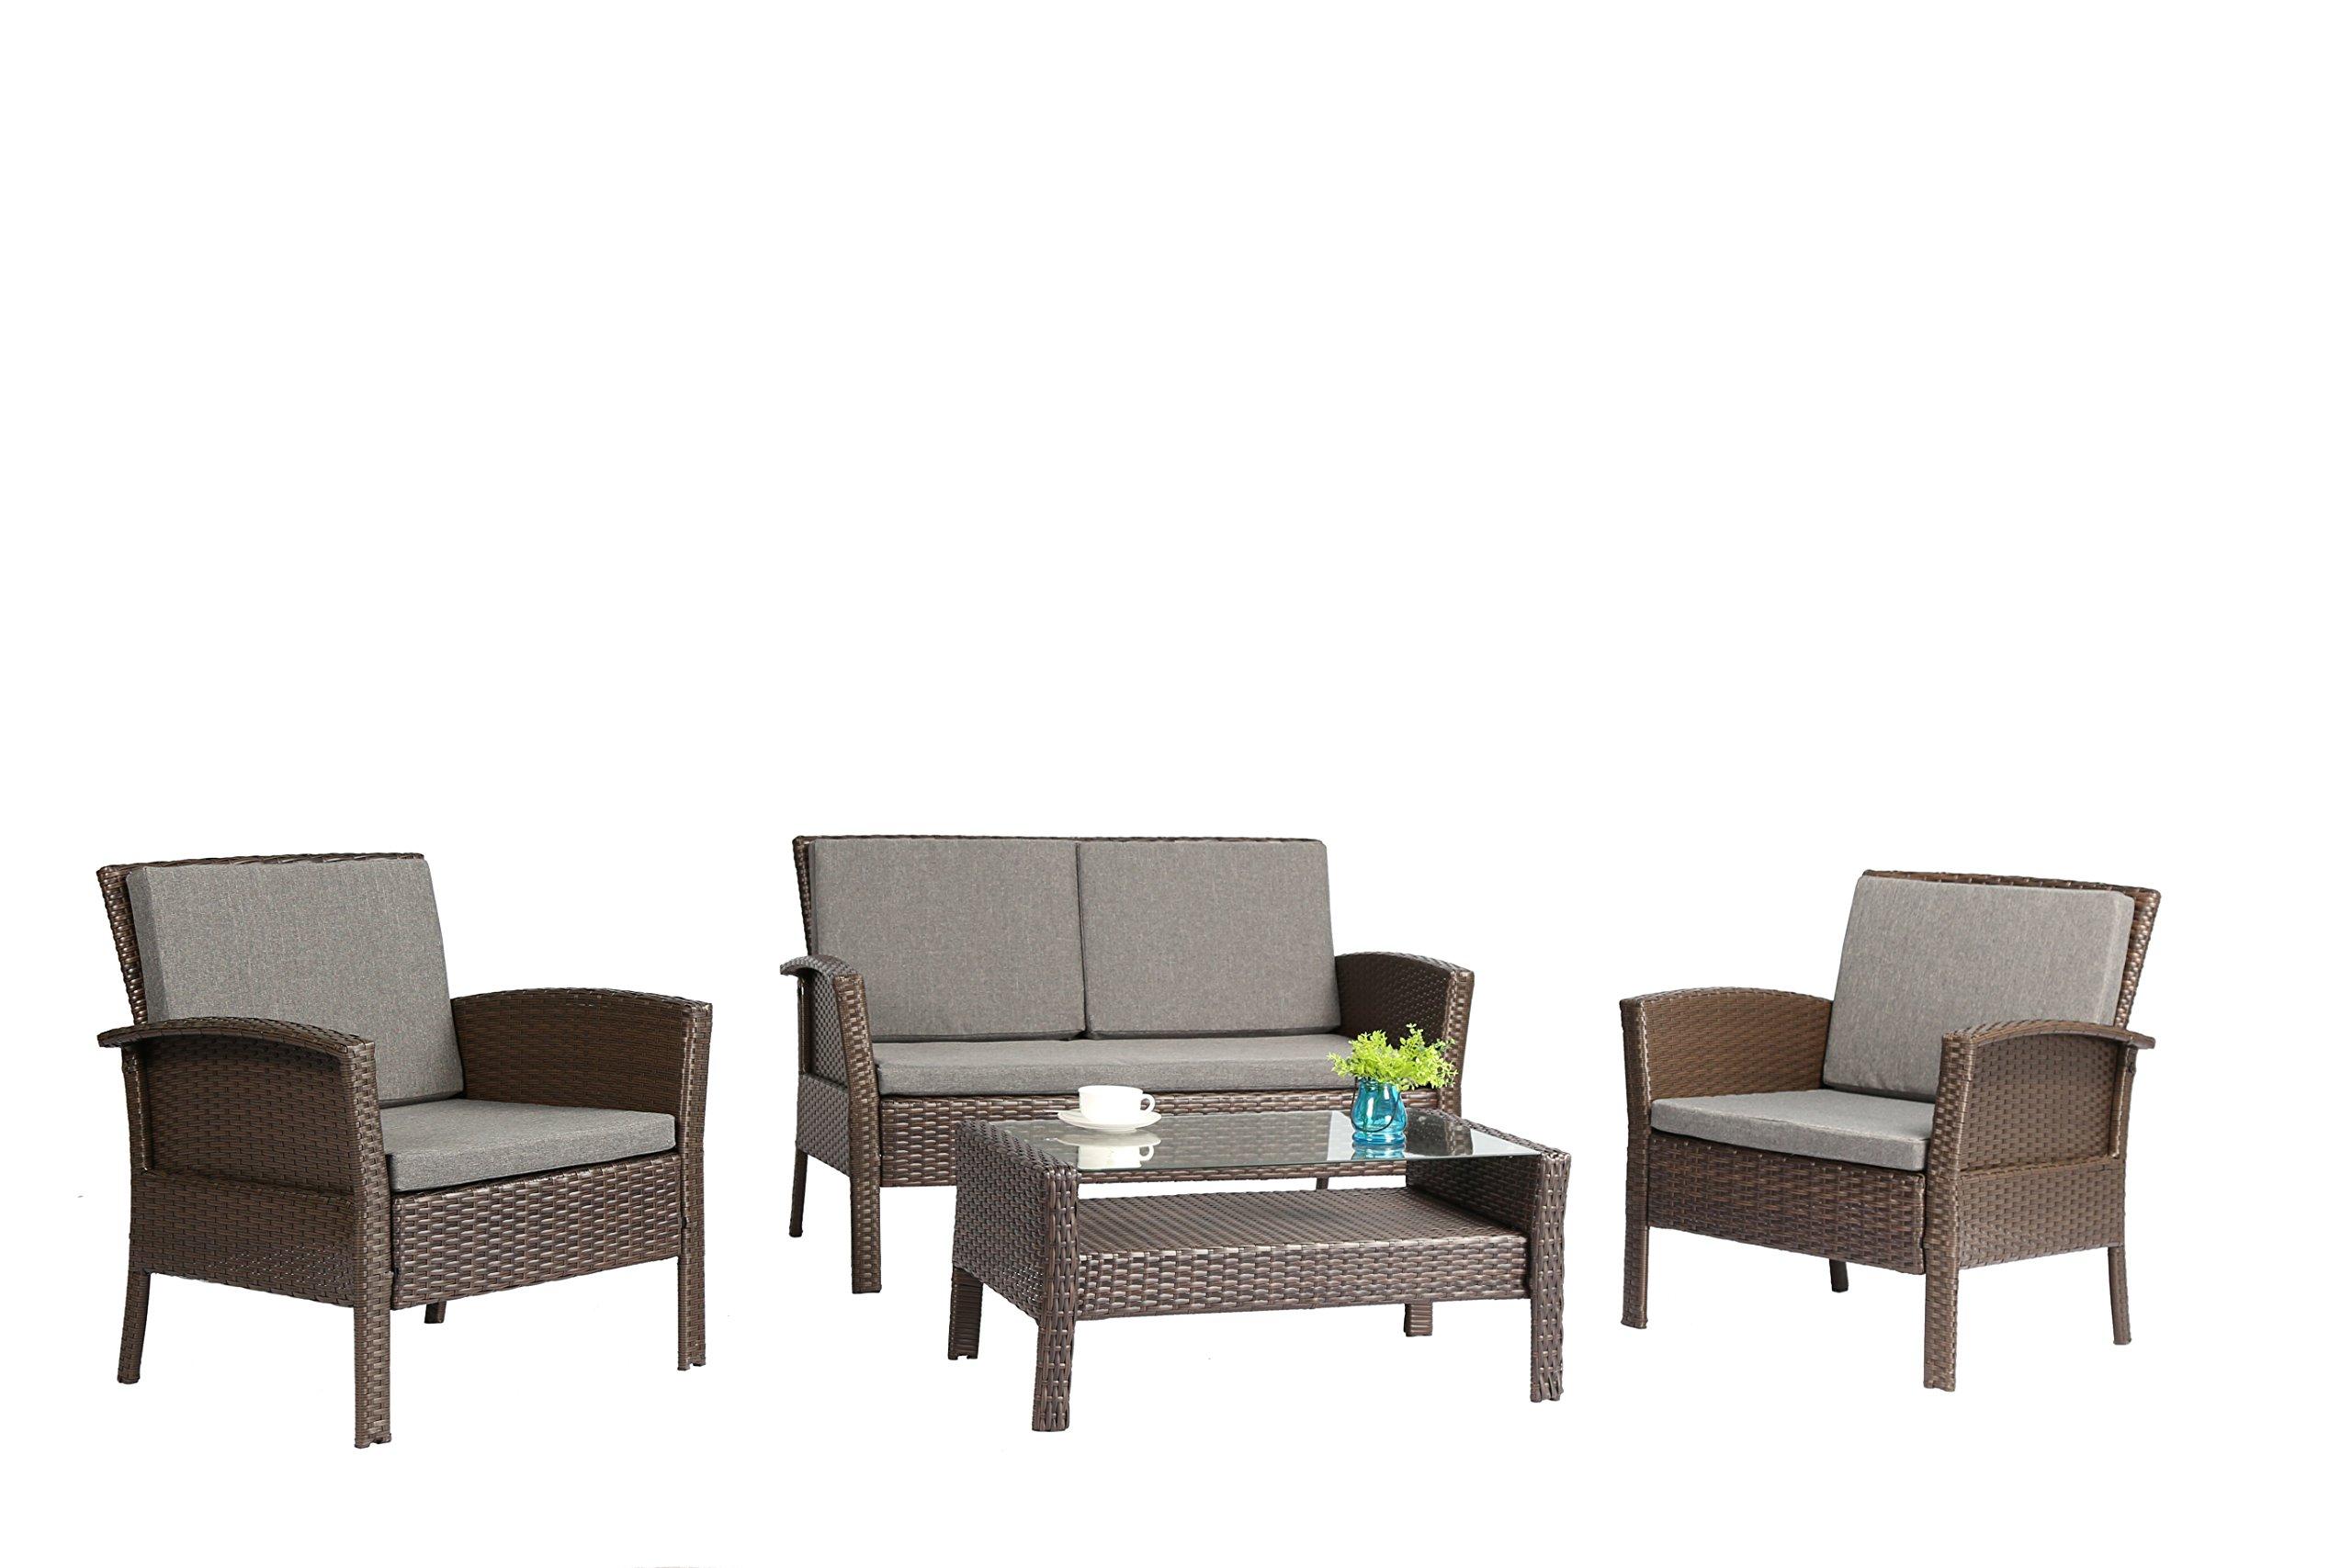 2c326bbf838c Baner Garden Outdoor Furniture Complete Patio 4 Piece Polyethylene Wicker  Rattan Garden Set, Brown (